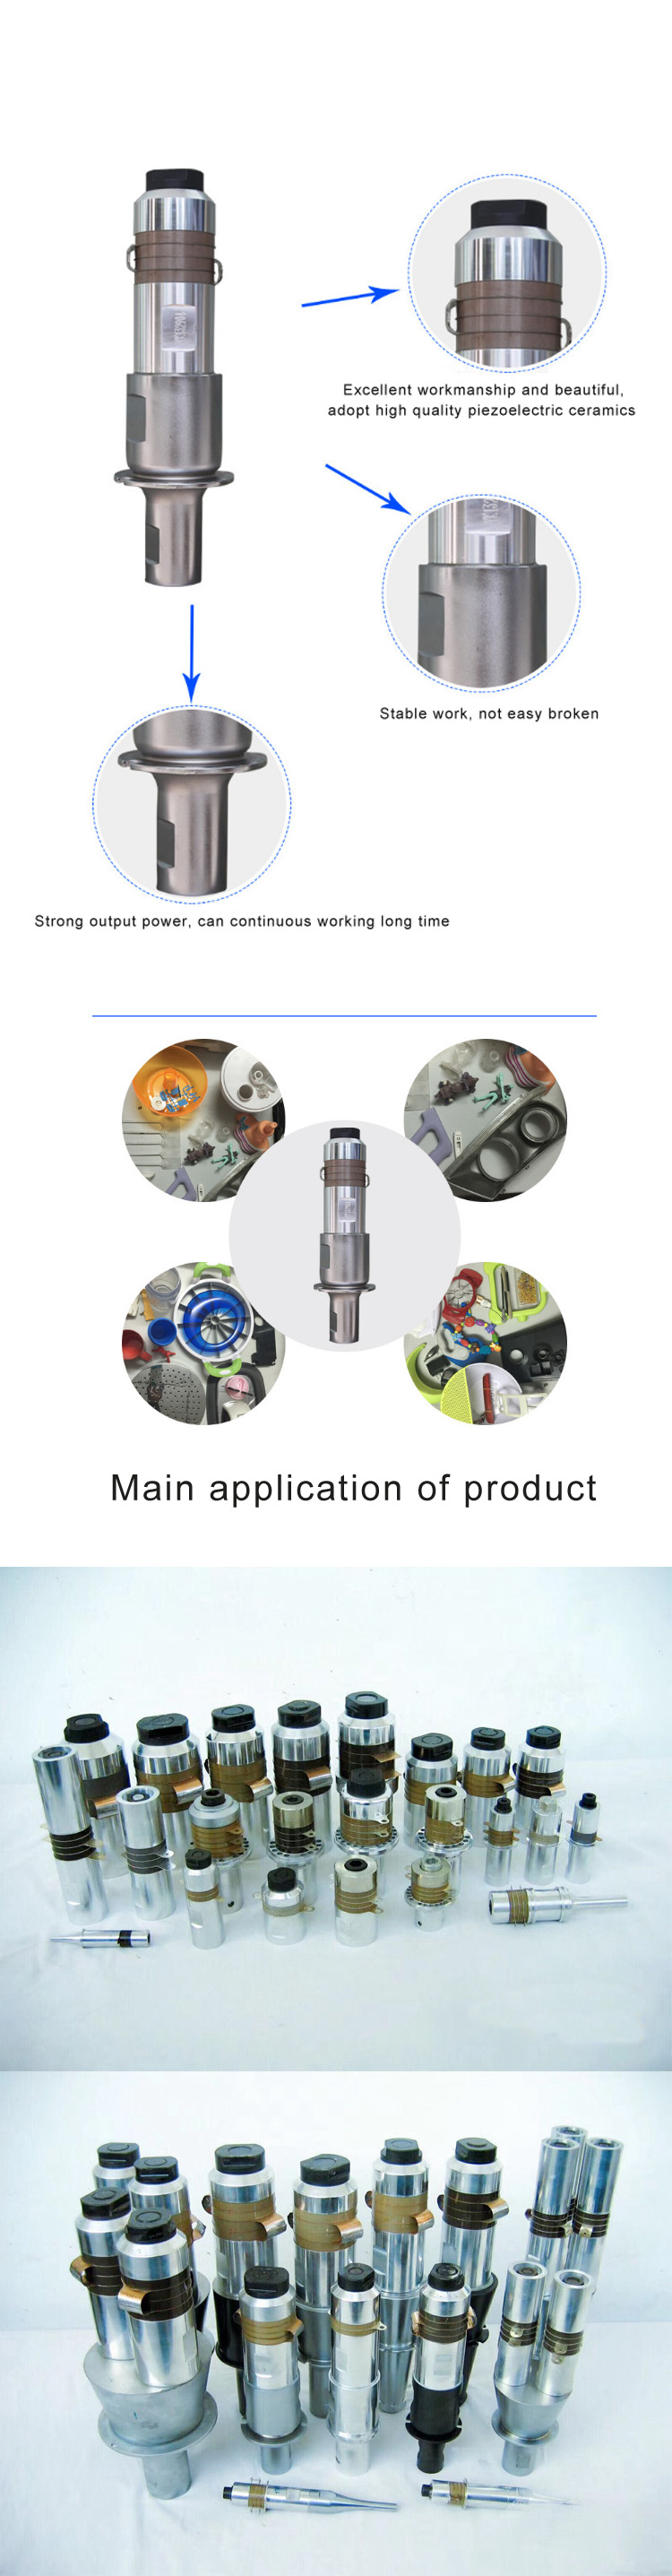 500w20khz Ultrasonic Welding Transducer Horn500w High Power Generator Circuit Gt 120w 110v 1500w 20khz